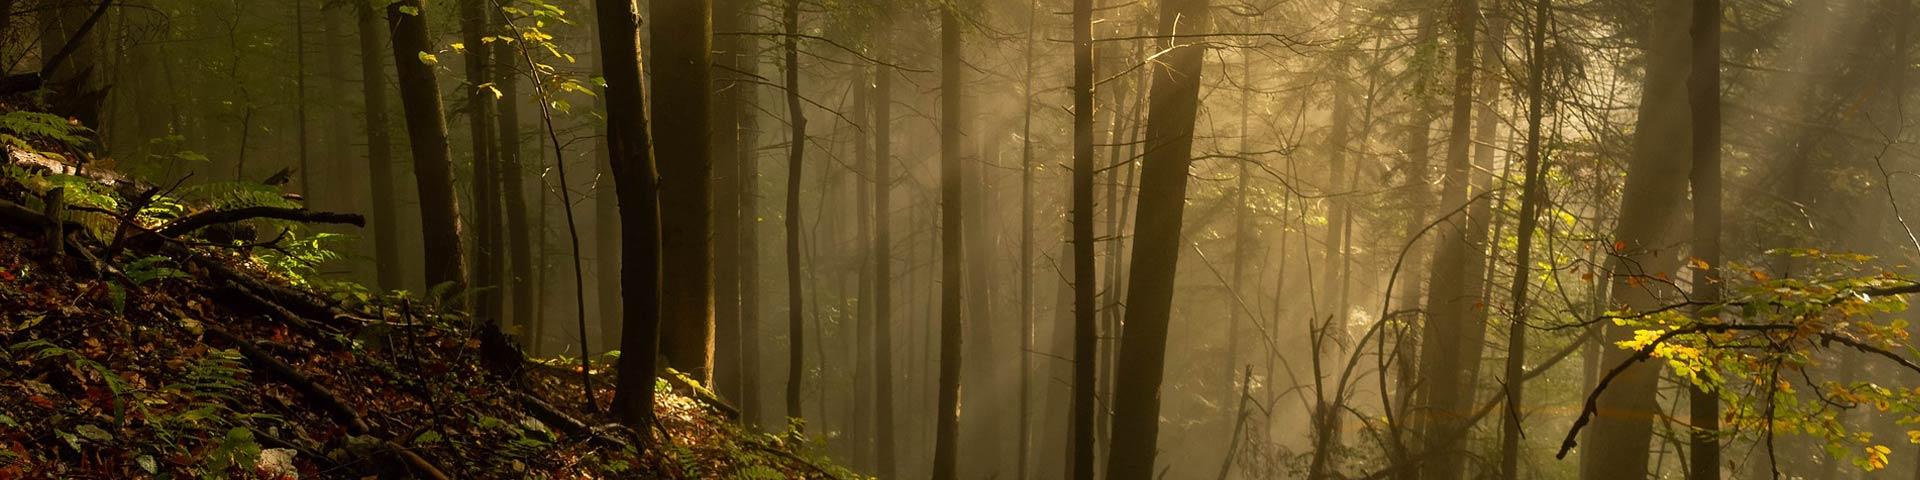 Bagno-di-foresta-un´antica-pratica-giapponese_Wildwisdom-Blog